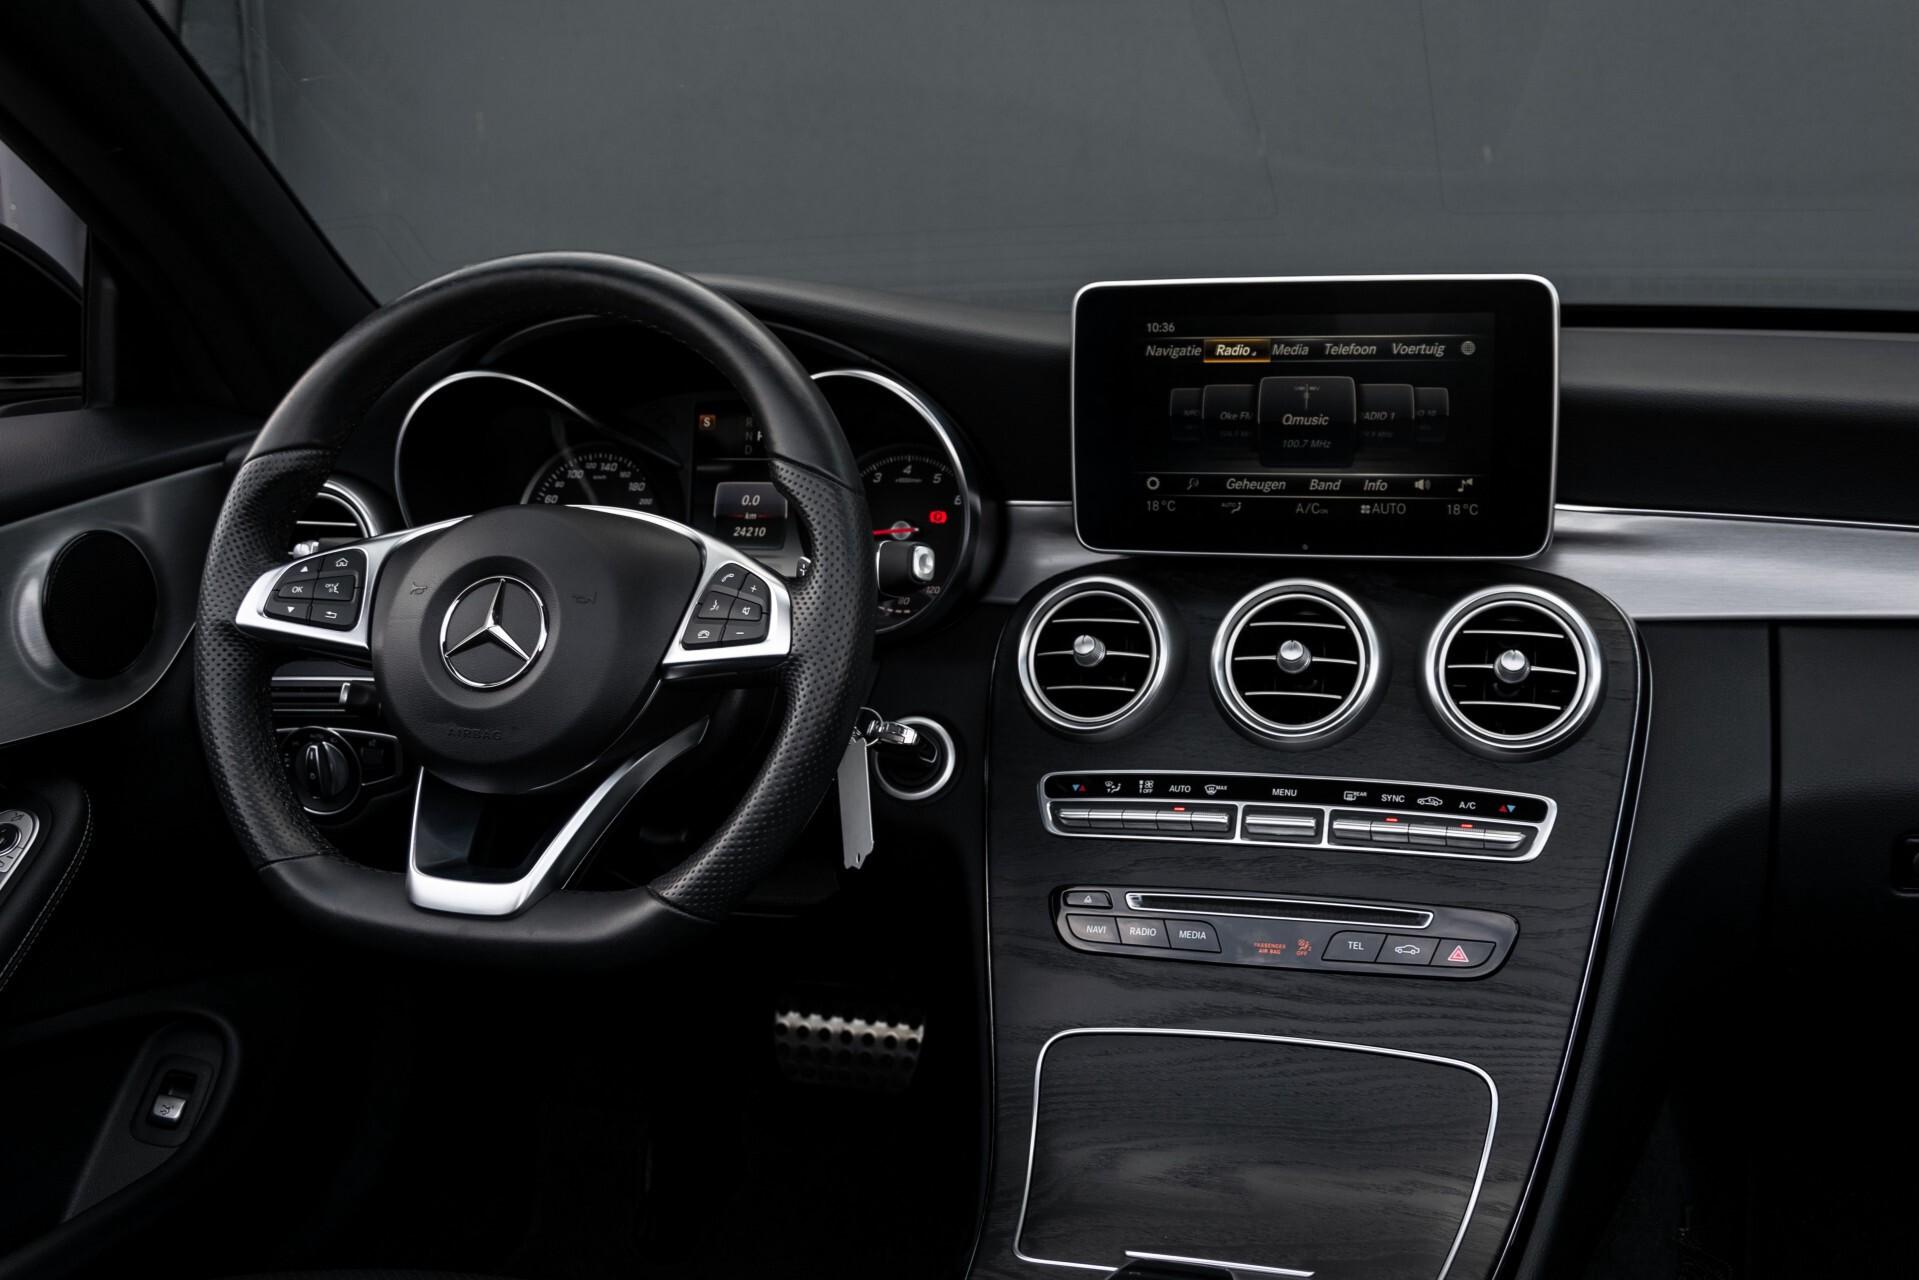 Mercedes-Benz C-Klasse Cabrio 250 AMG Airscarf/Aircap/Comand/ILS/Camera/Rode cabriokap Aut9 Foto 7